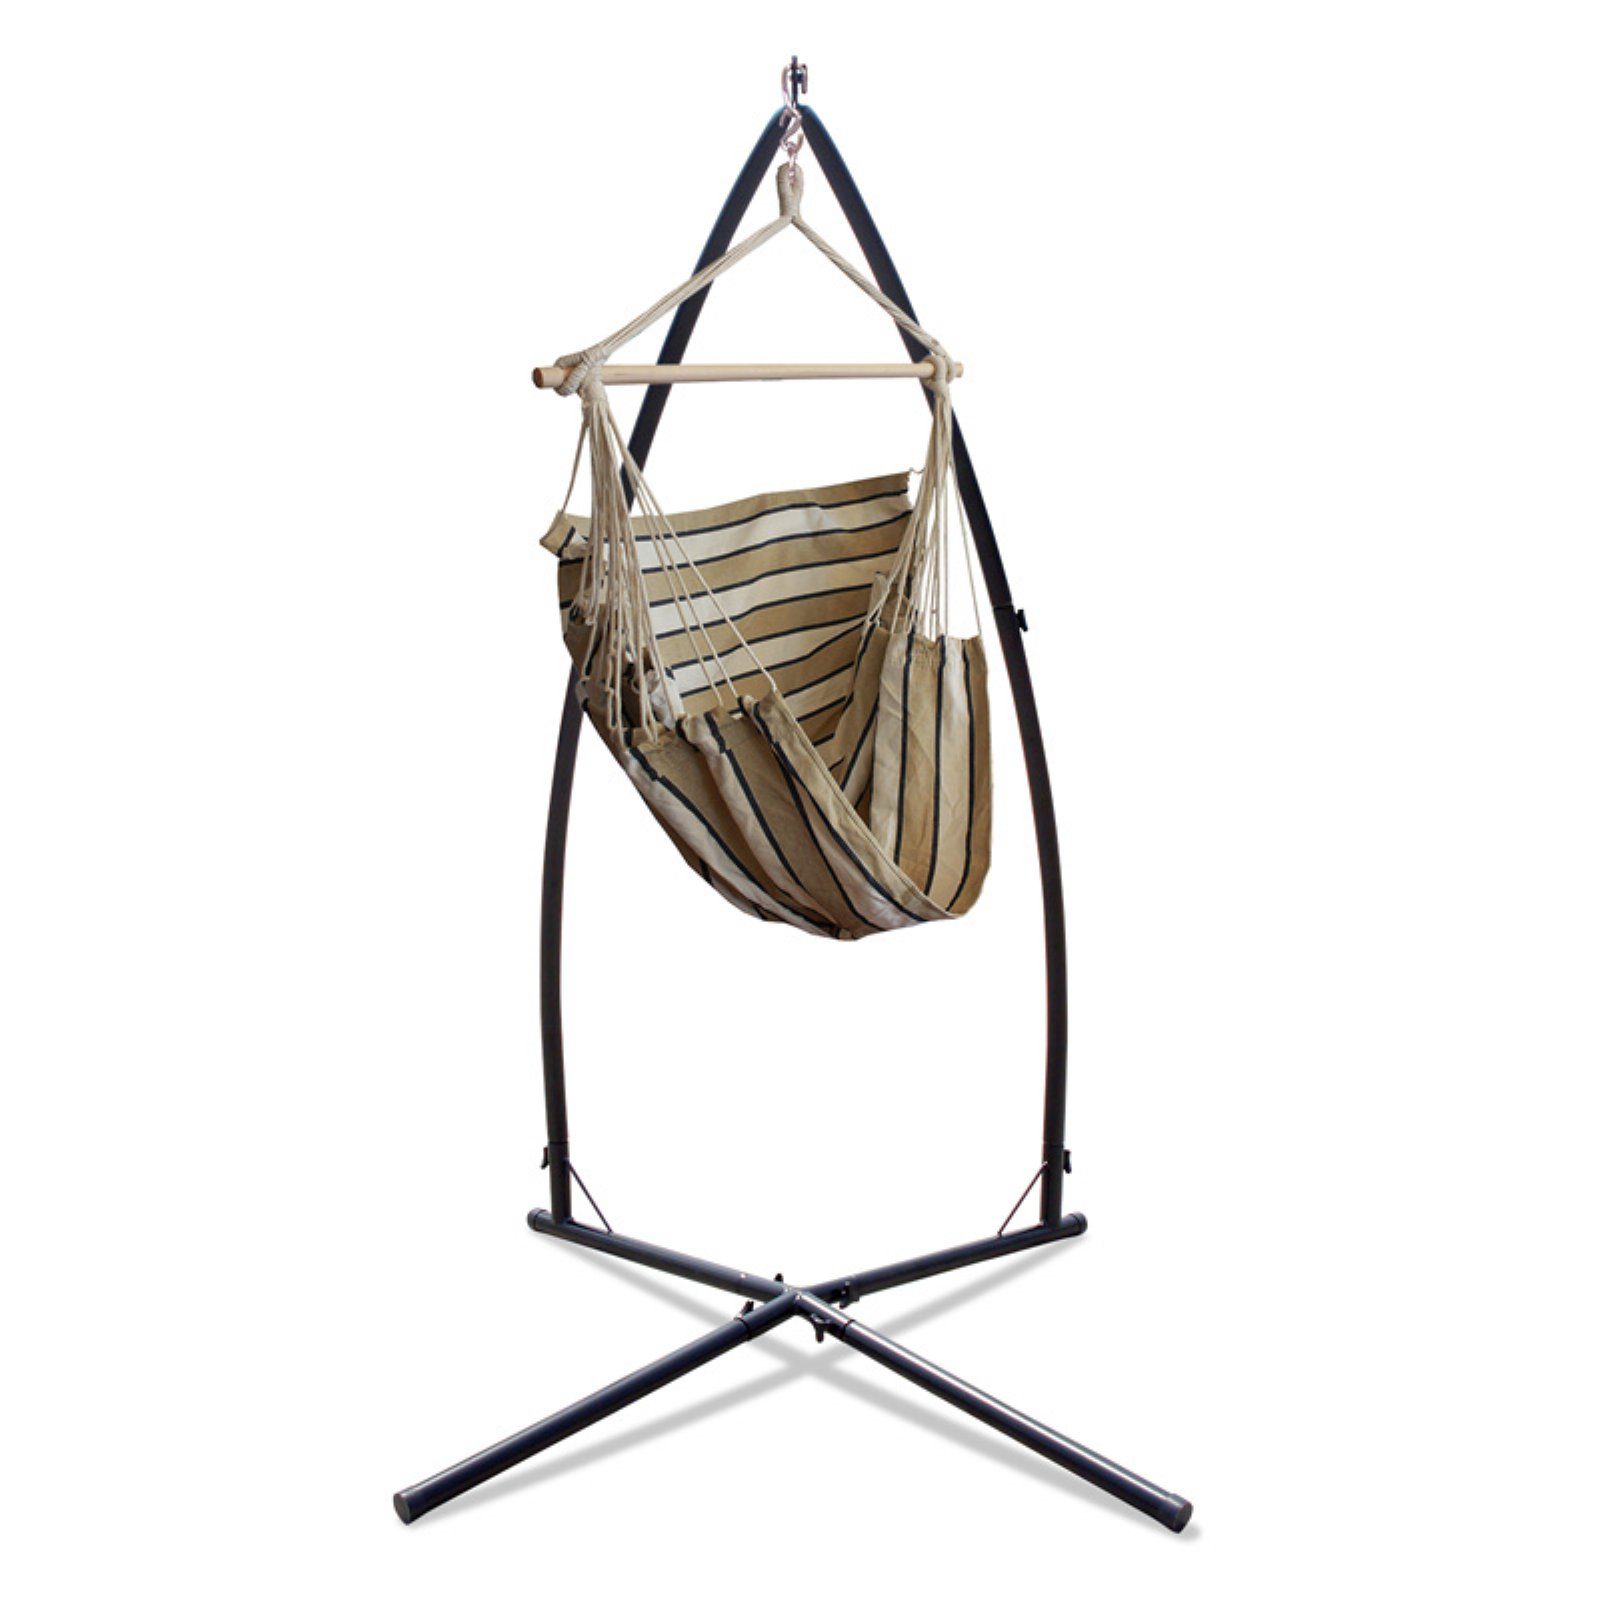 Hammaka Woven Fabric Hammock Chair with Summit Stand